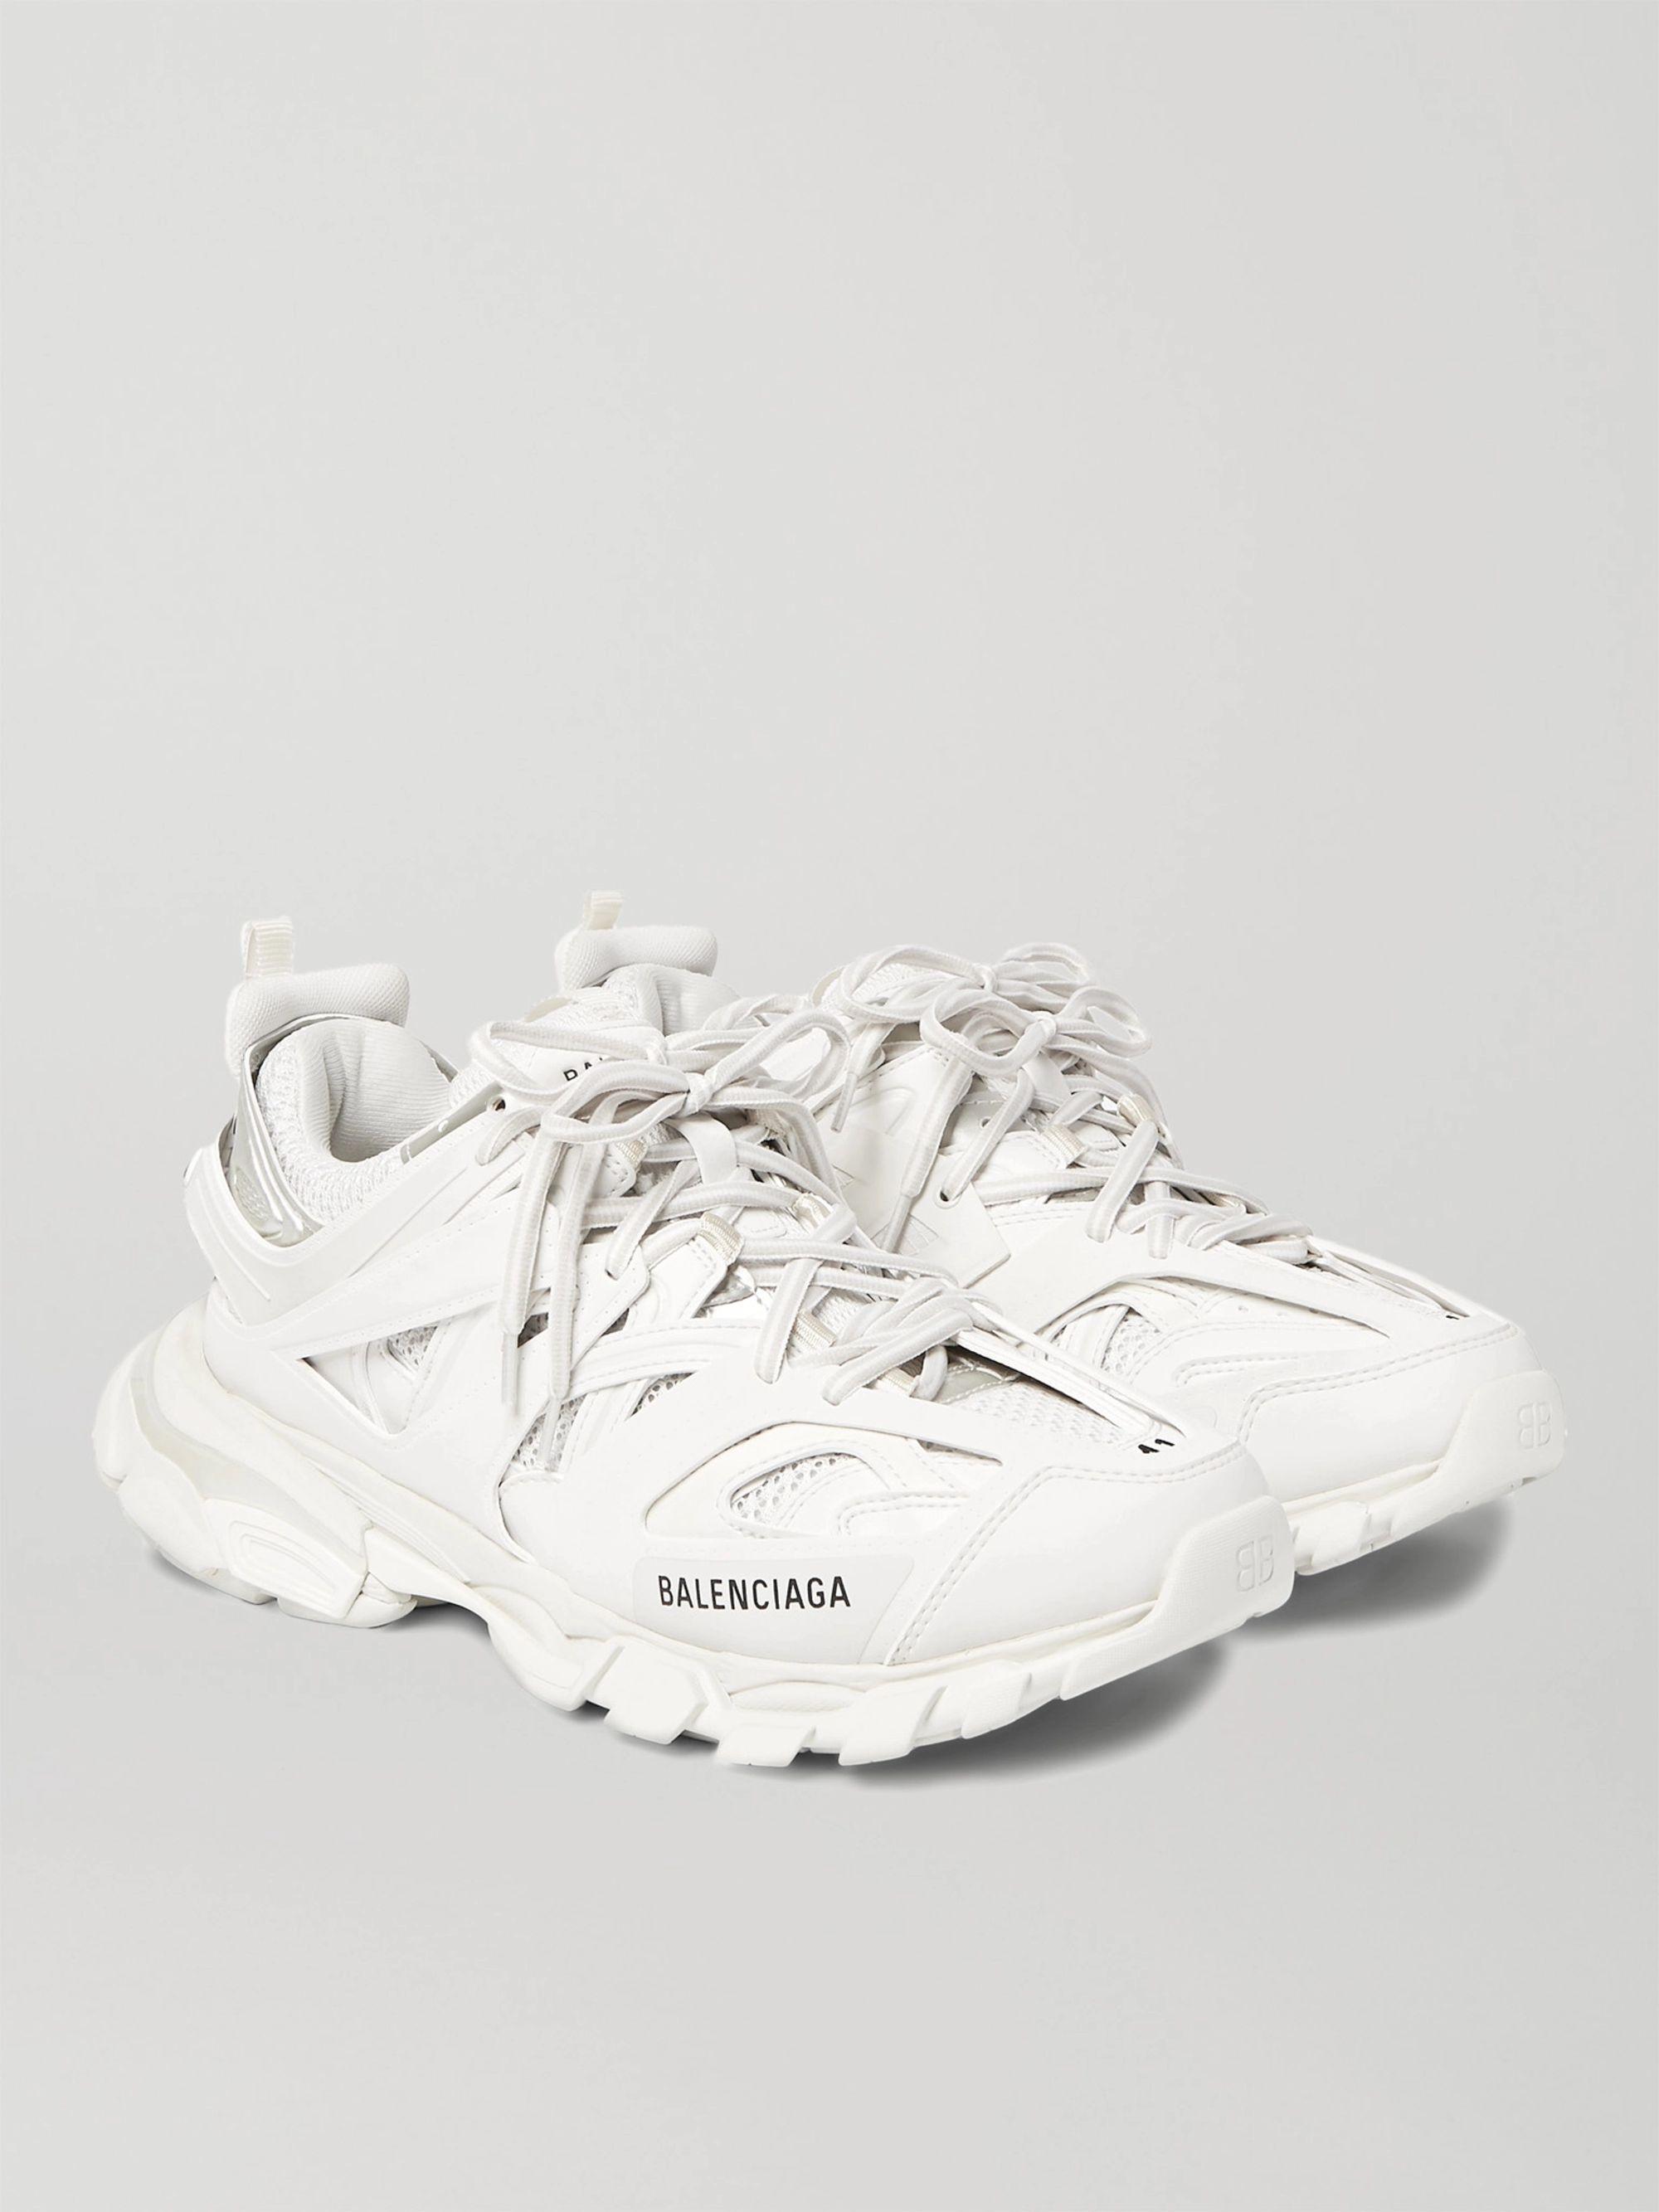 balenciaga white tennis shoes